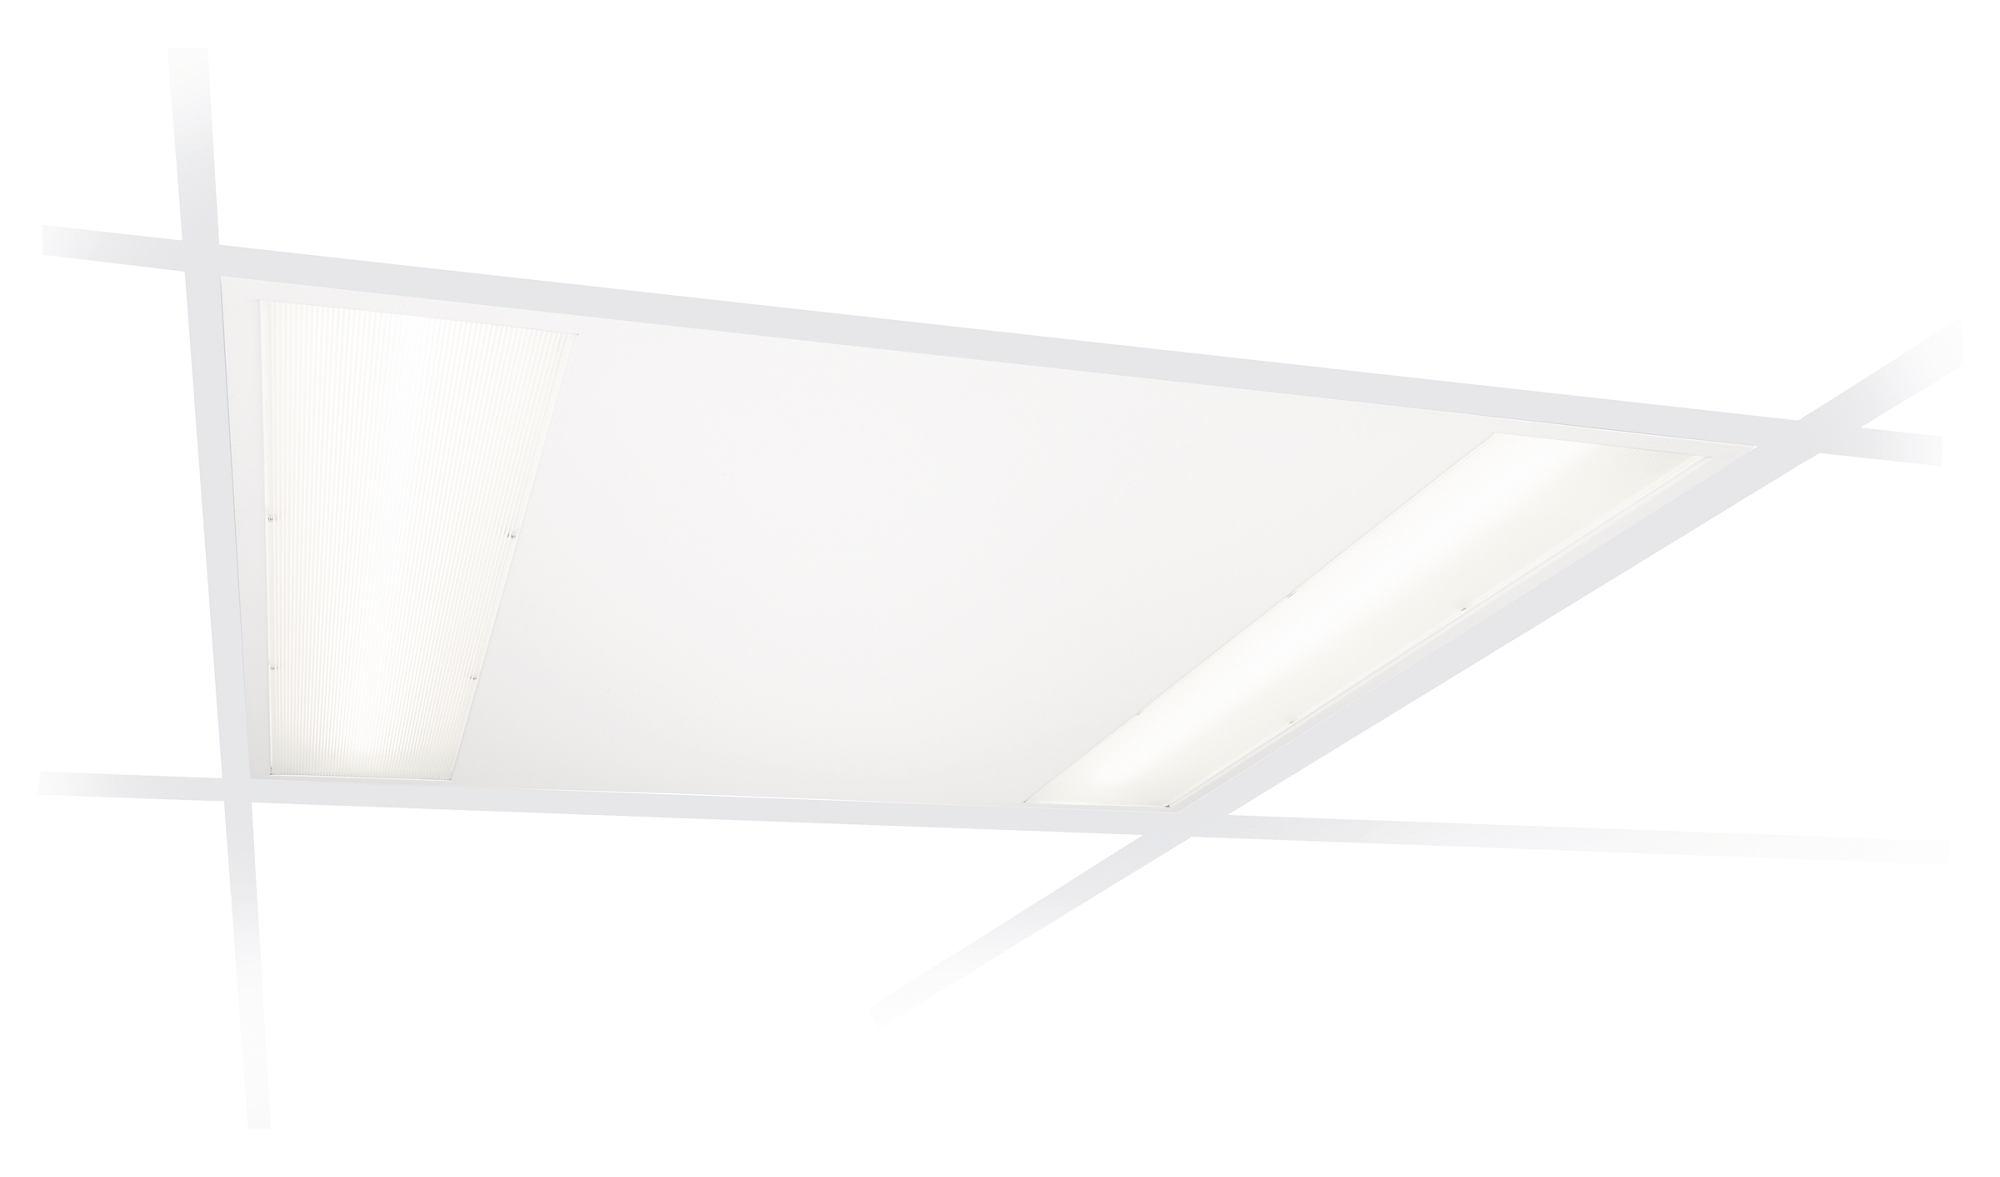 PHILIPS 88138400 LED-Einlegeleuchte CoreLine RC122B 27,5